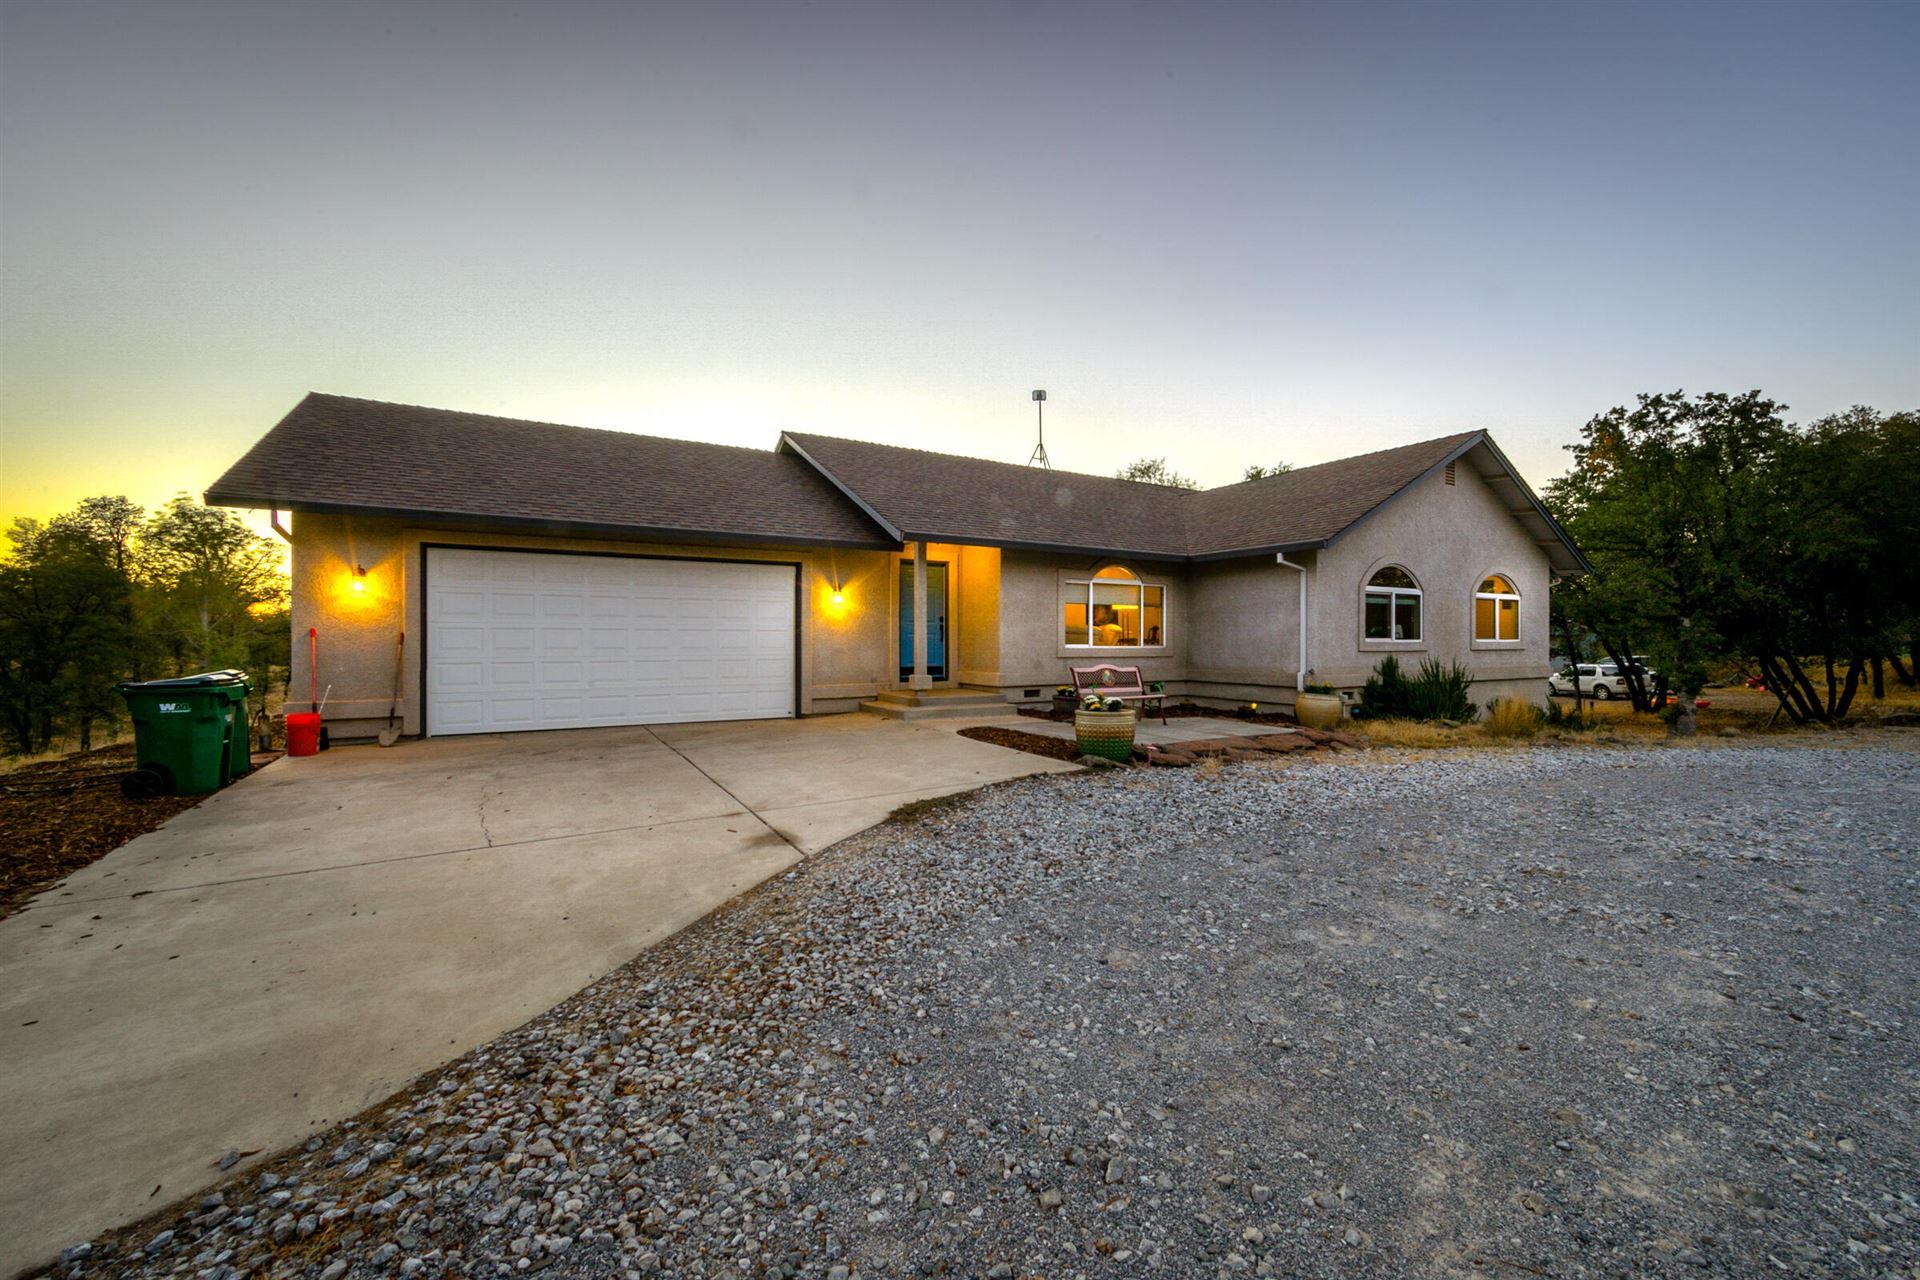 Photo of 10844 Green Oaks Ln, Redding, CA 96003 (MLS # 21-4884)